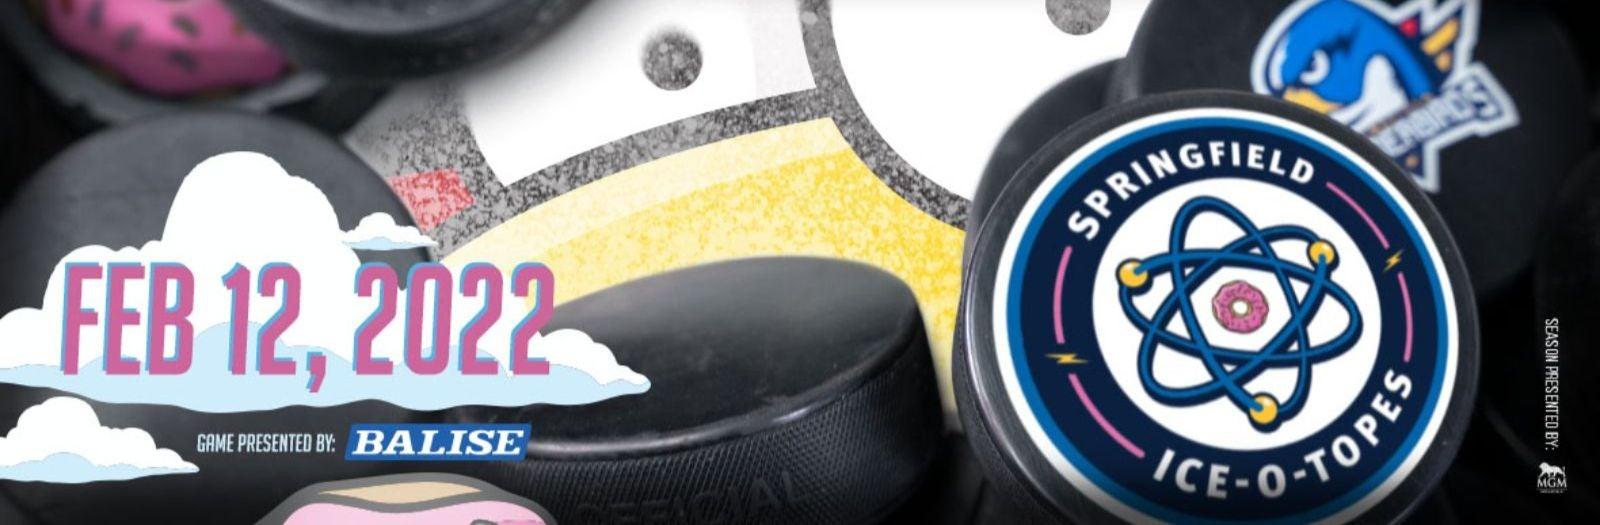 Springfield Ice-O-Topes vs Providence Bruins